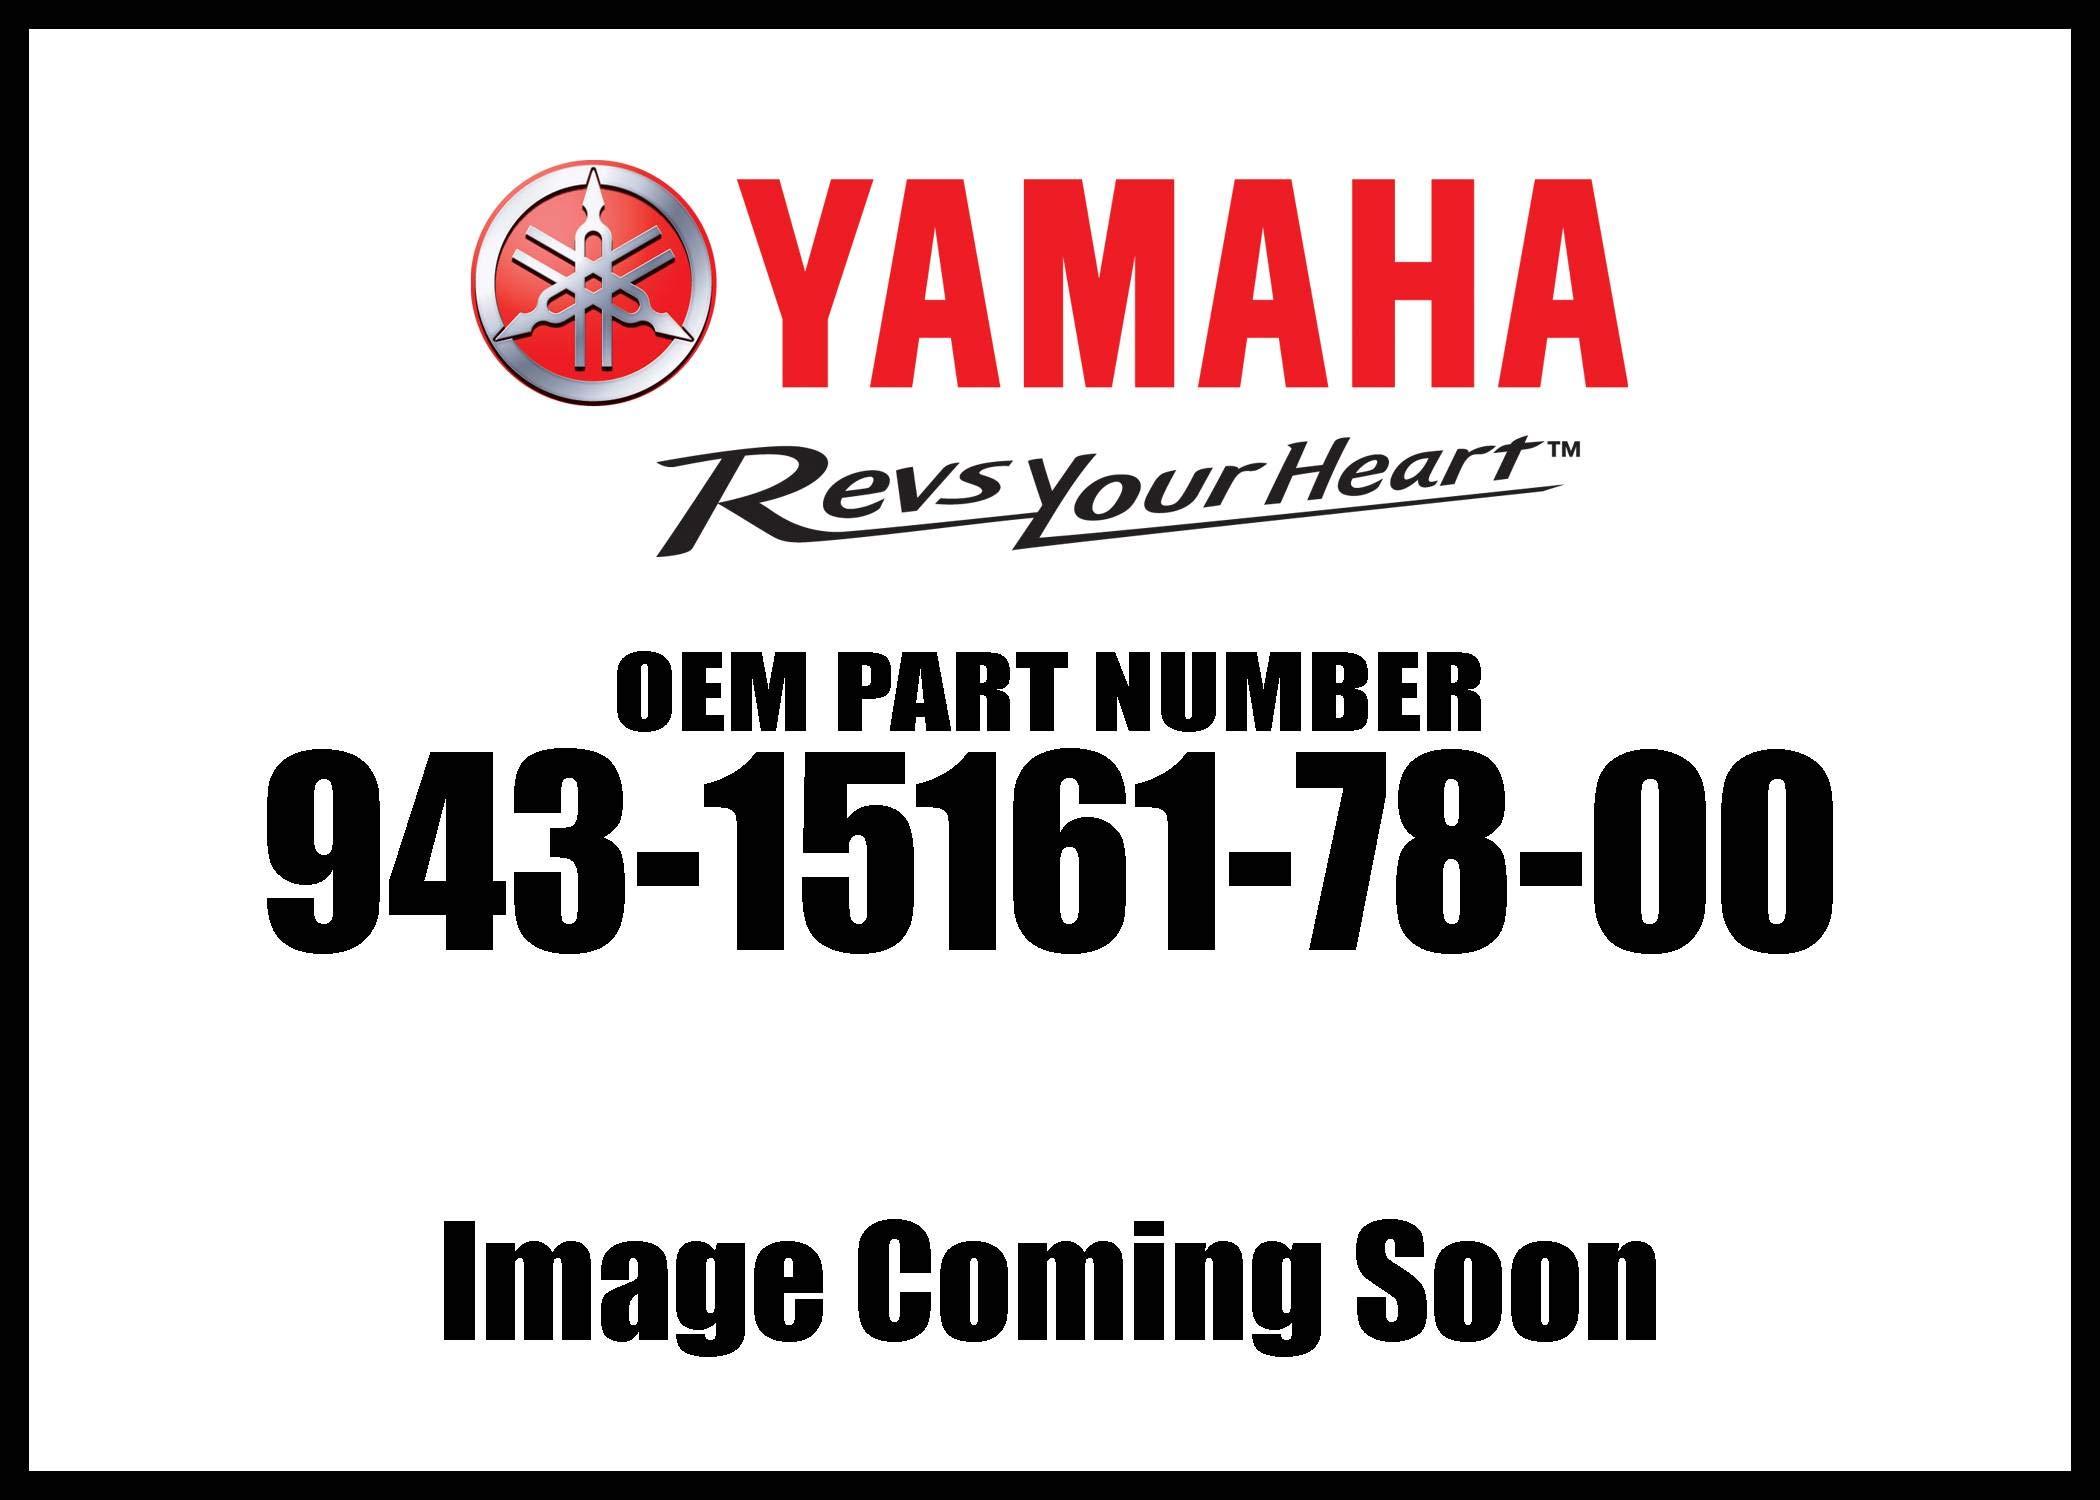 Yamaha 94315-16178-00 BAND, RIM (3.50-16); 943151617800